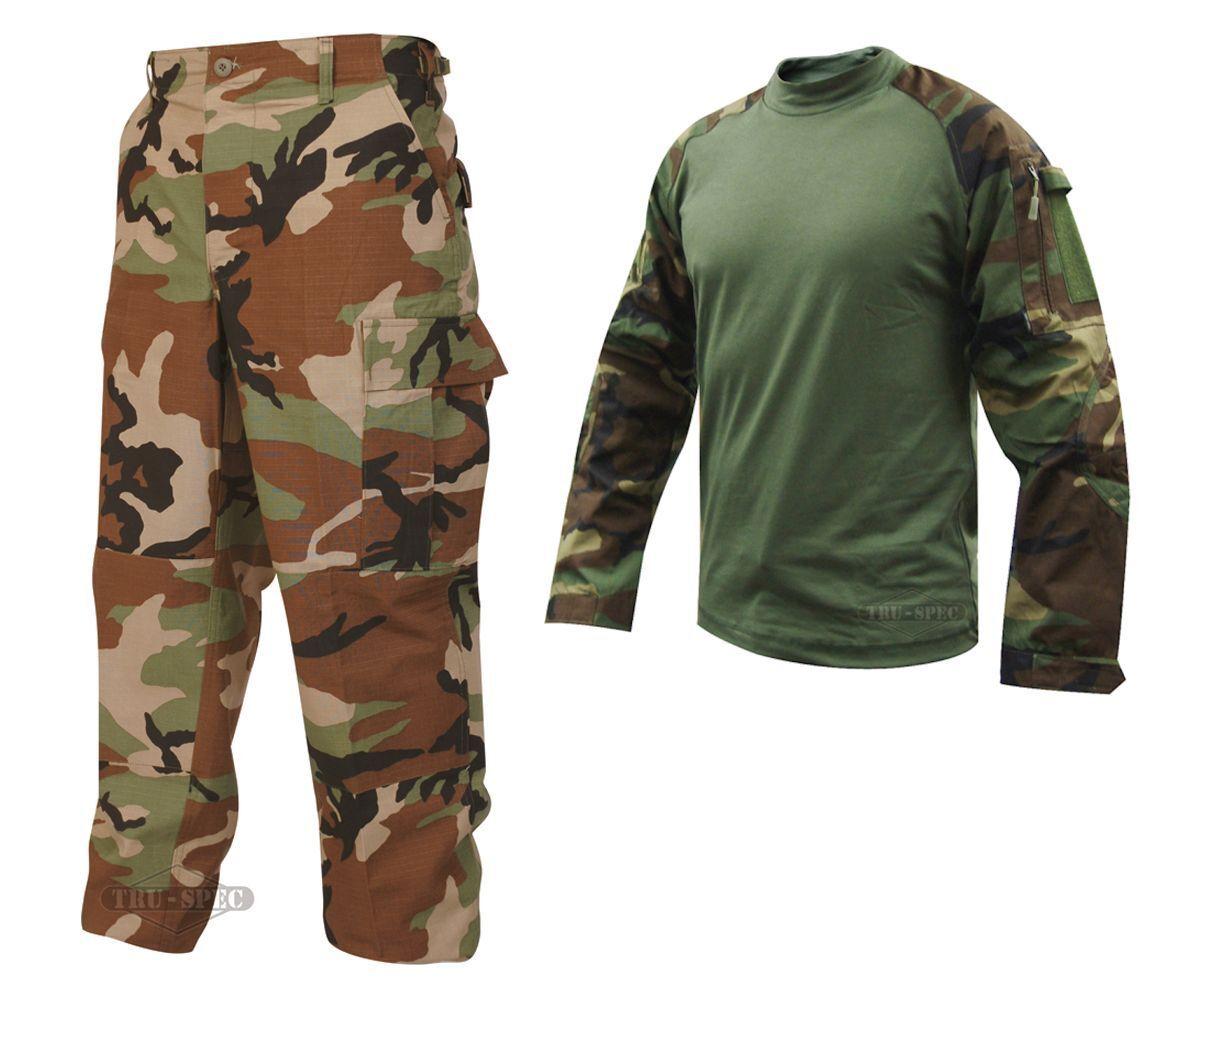 Tru-Spec Woodland Combat Shirt BDU Pants Ripstop Mil-Spec Camoflauge